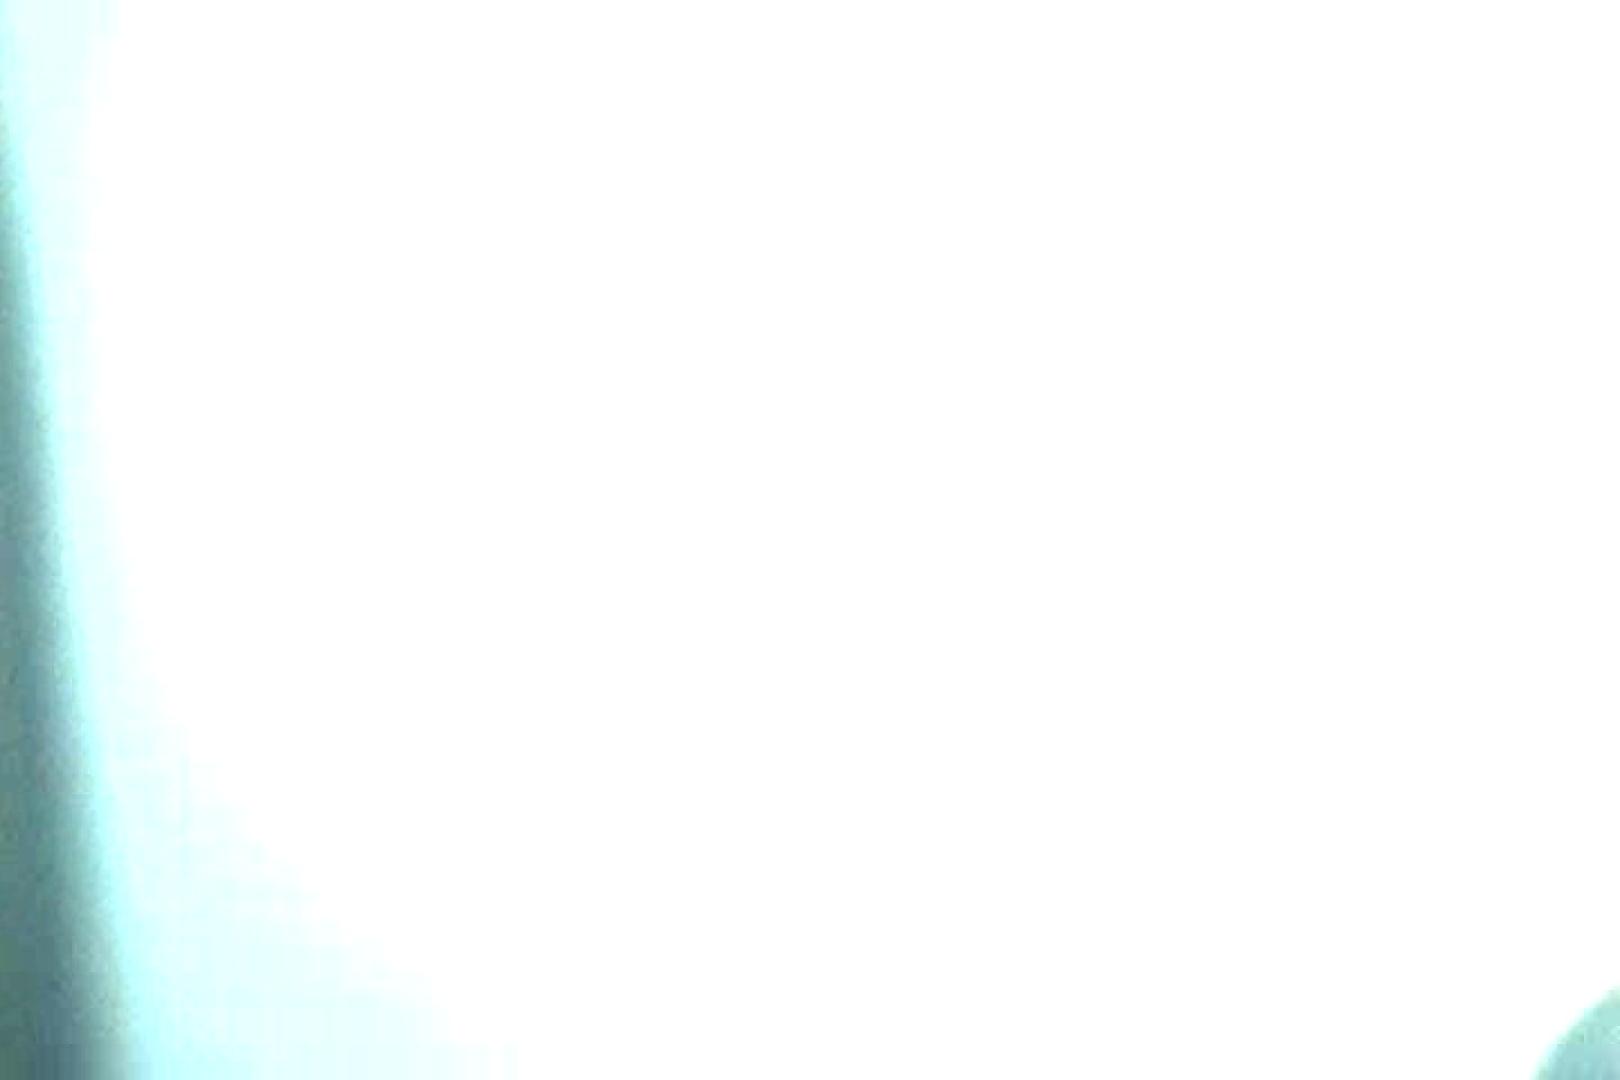 充血監督の深夜の運動会Vol.4 美女OL  74連発 30